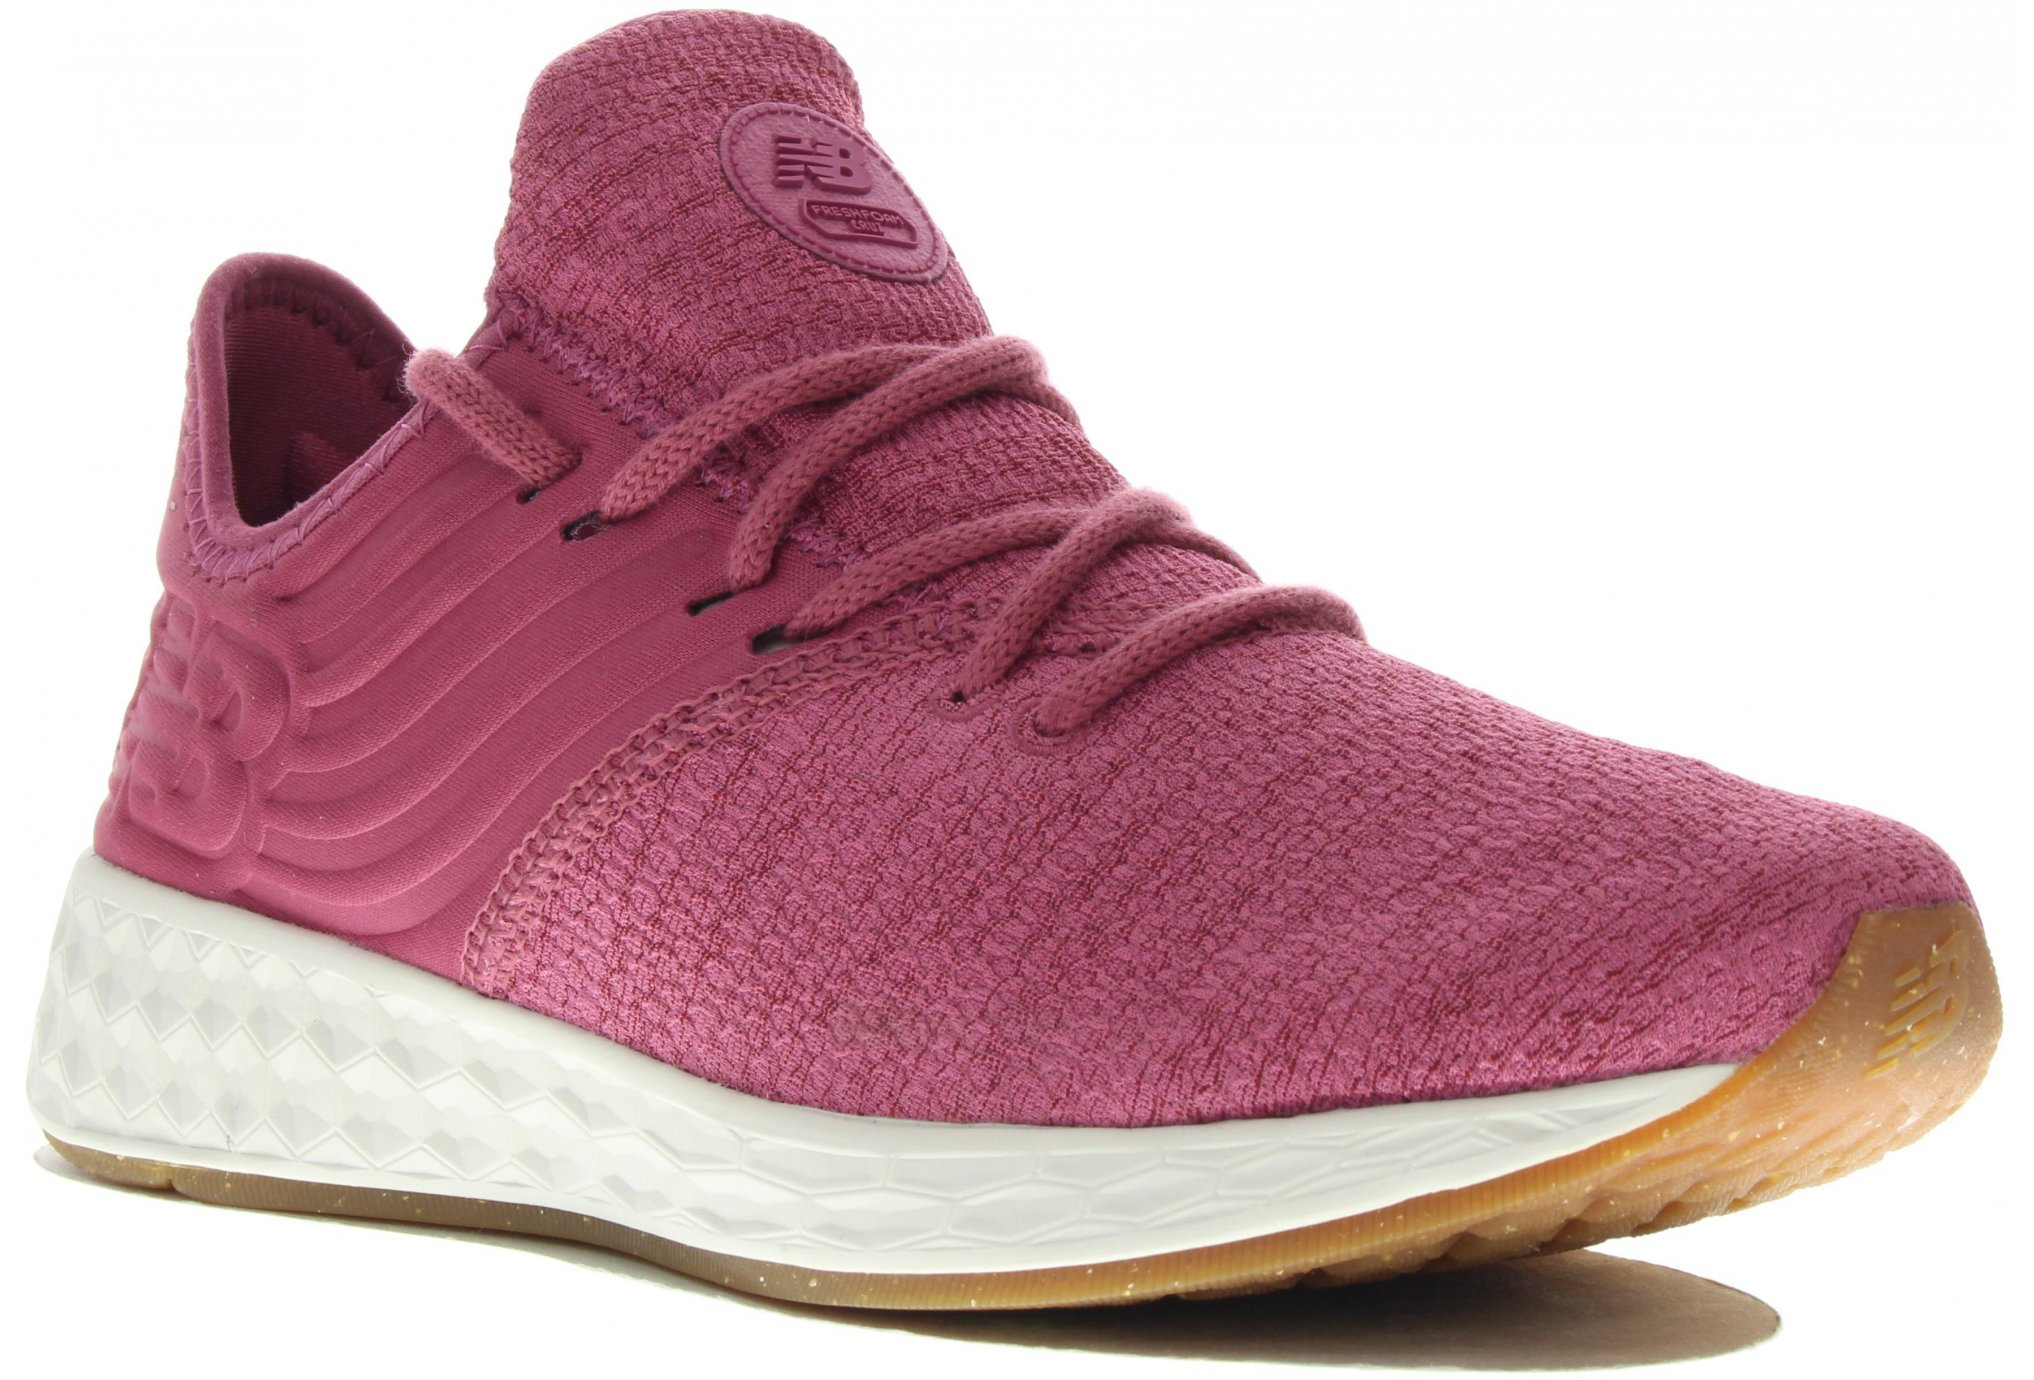 New Balance Fresh Foam Cruz Decon W Diététique Chaussures femme